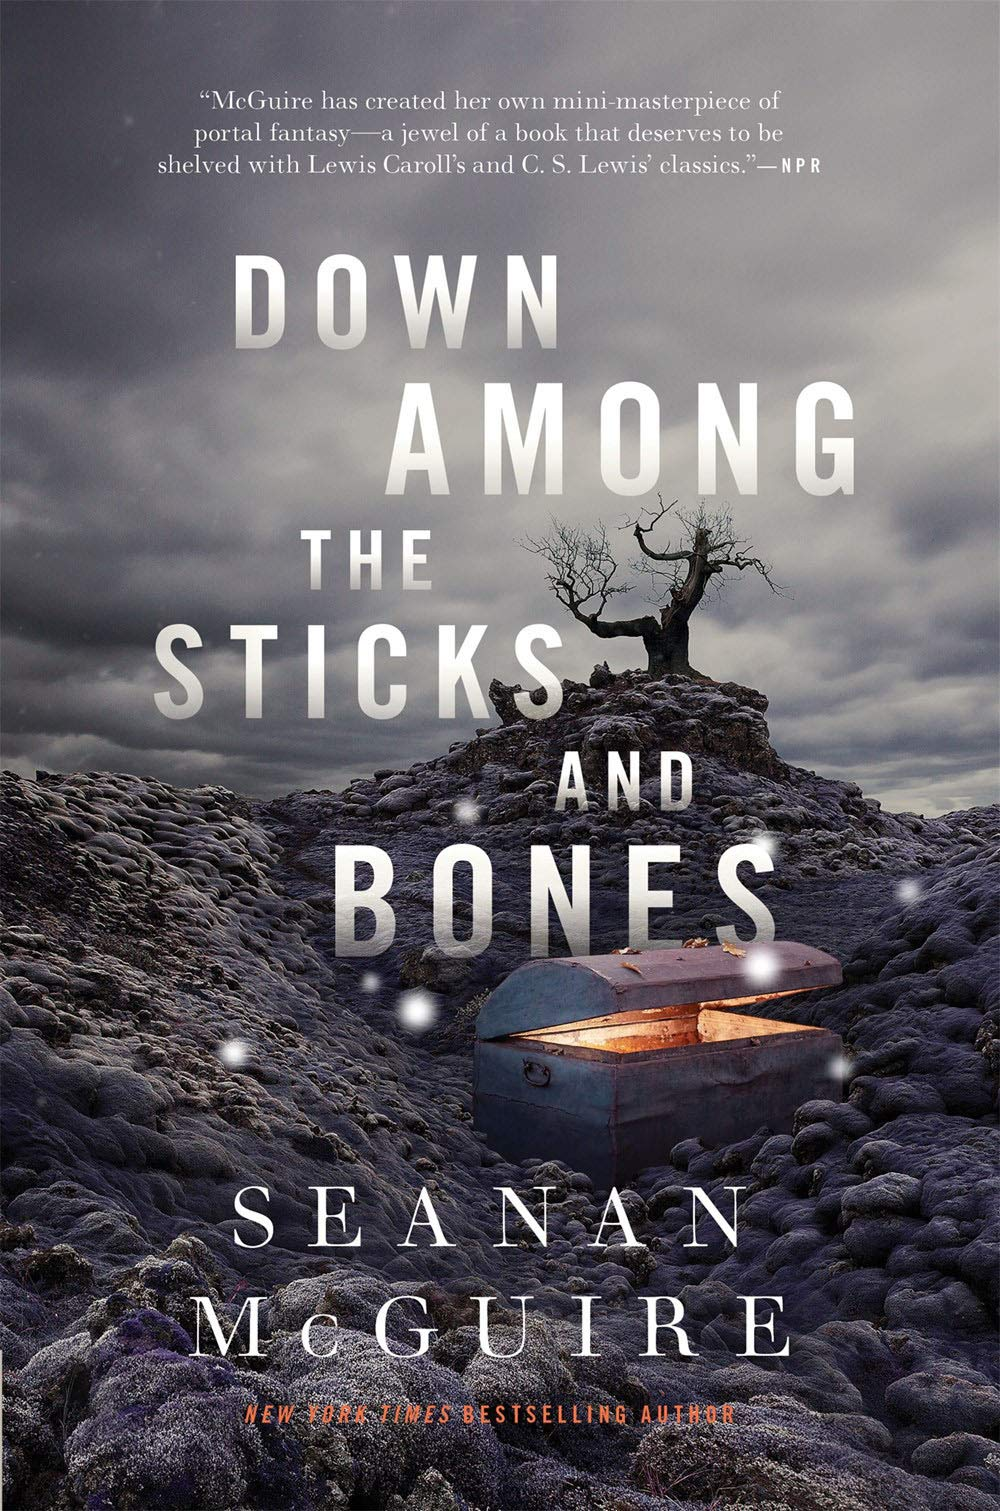 Wayward Children tome 1 de Seanan McGuire : Down Among The Sticks and Bones